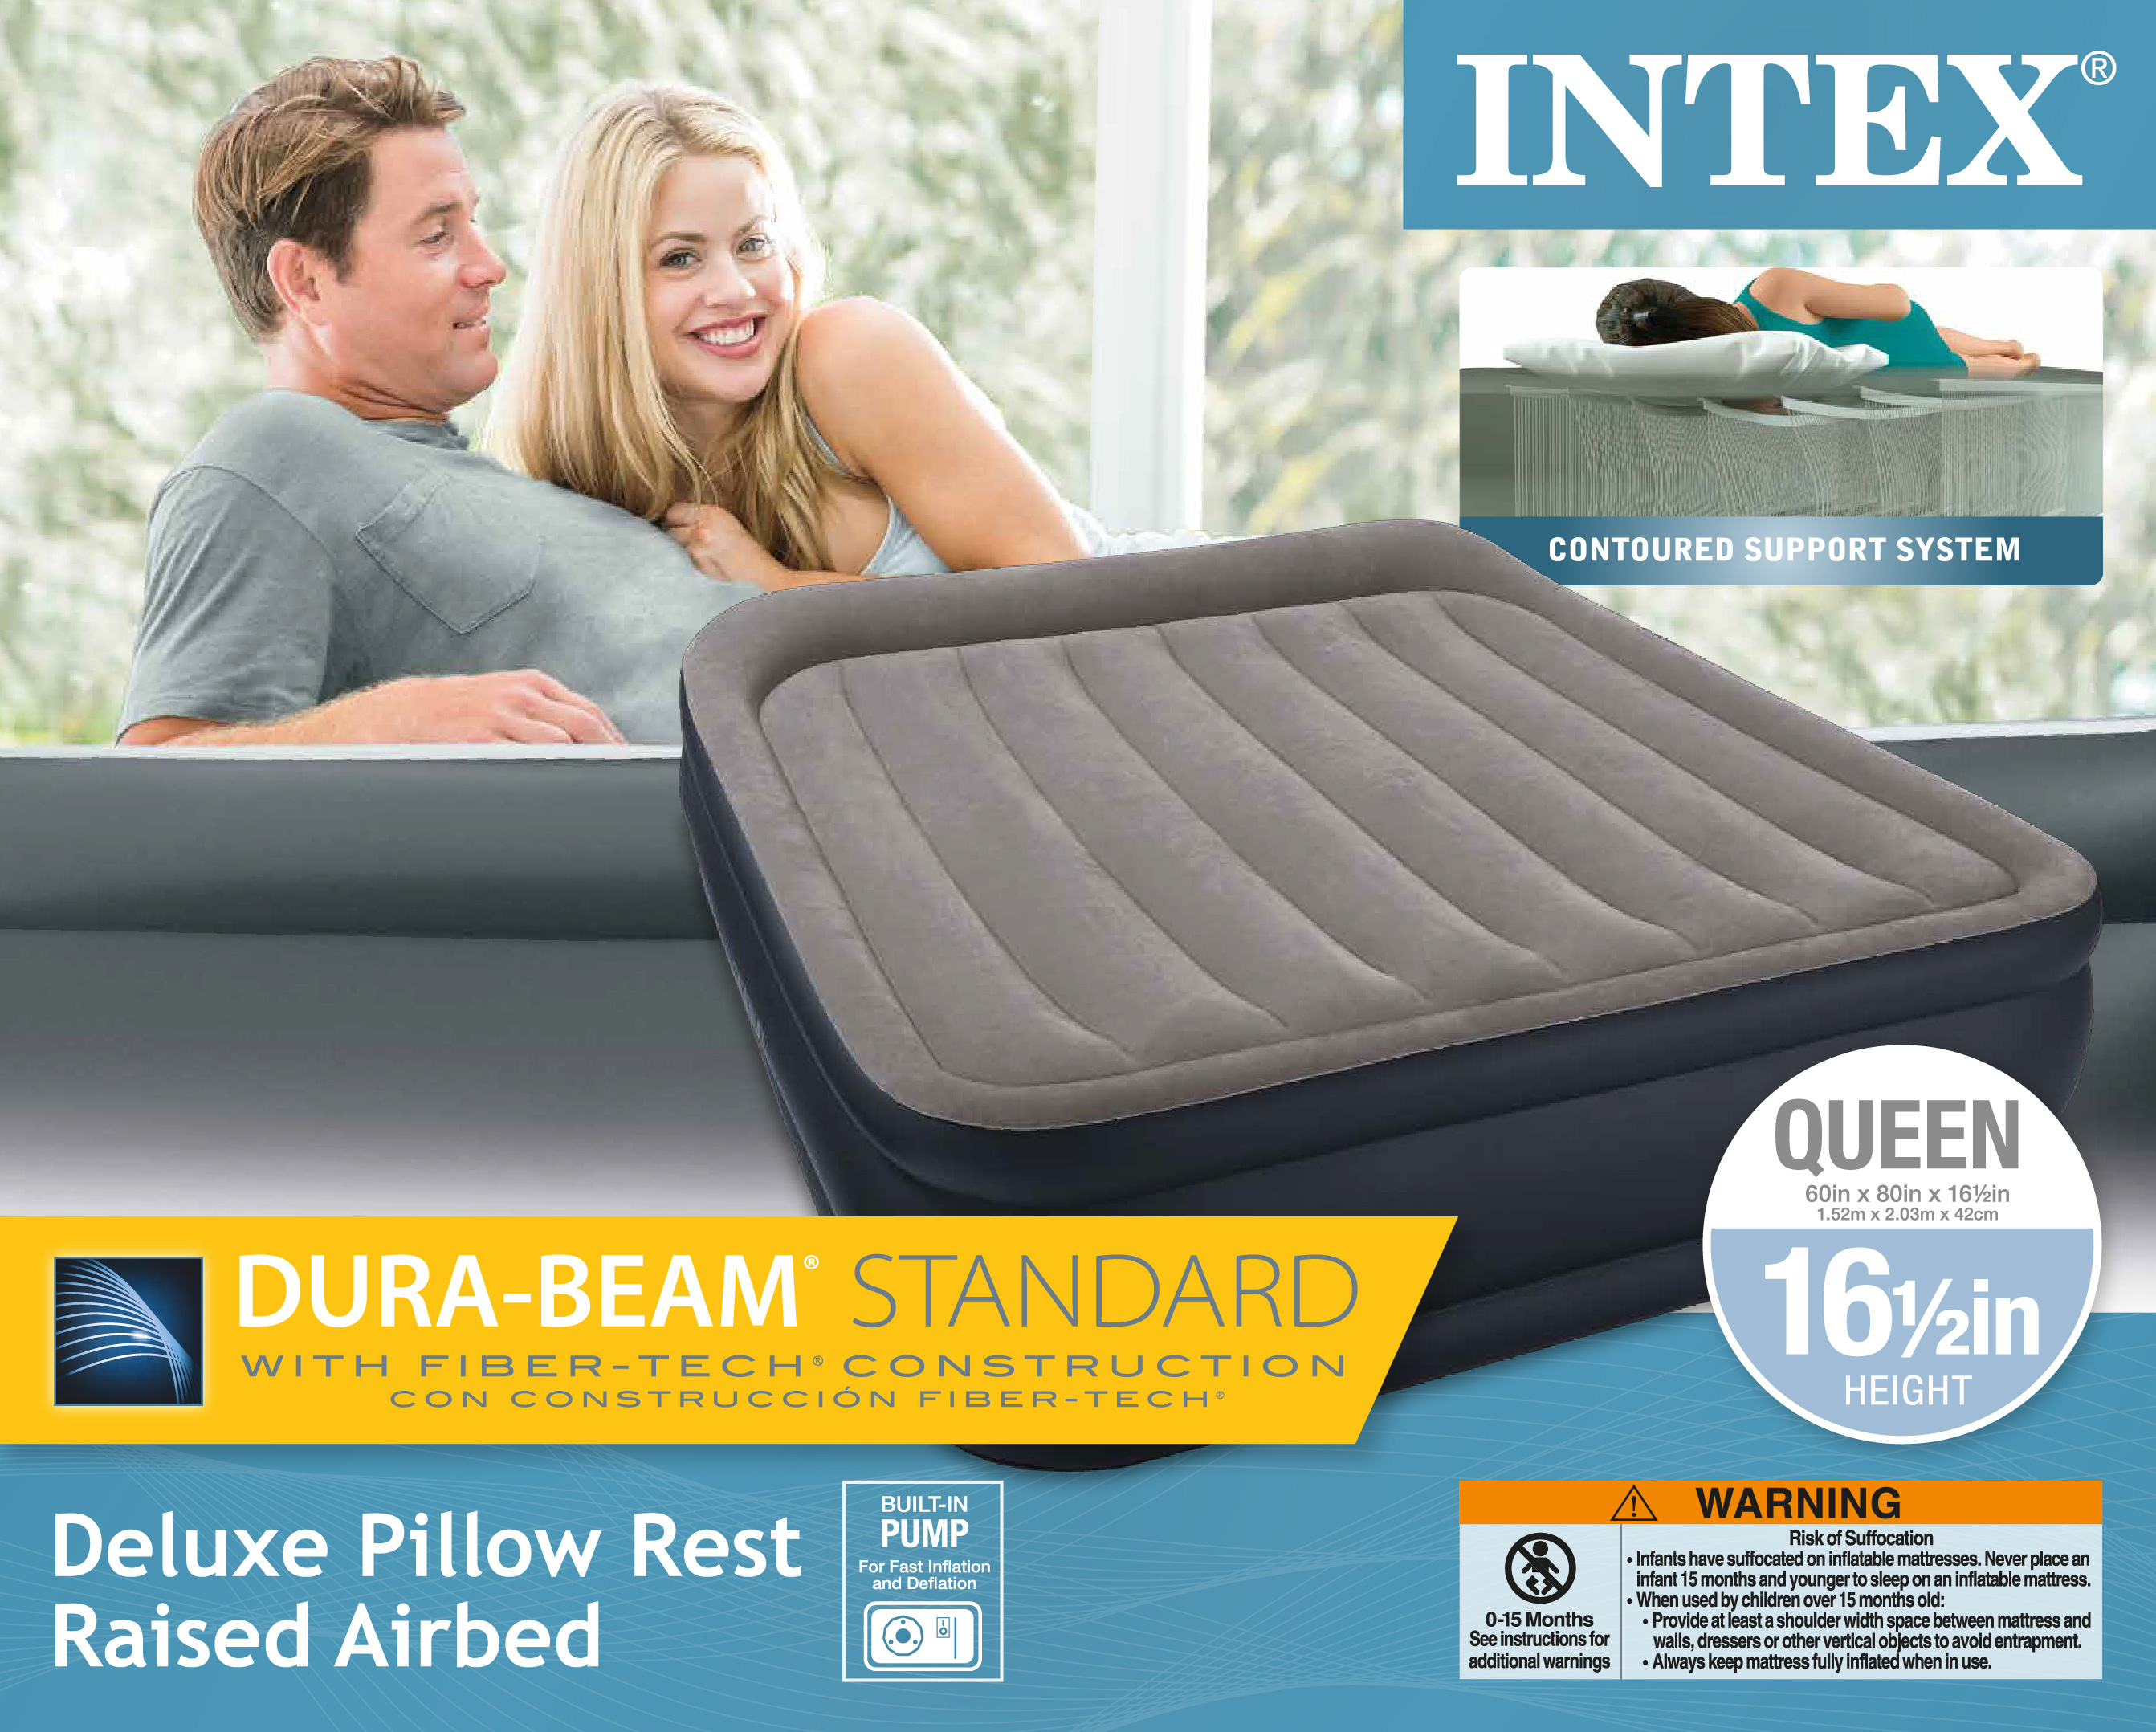 Intex Queen Deluxe Pillow Rest Raised Airbed Air Mattress